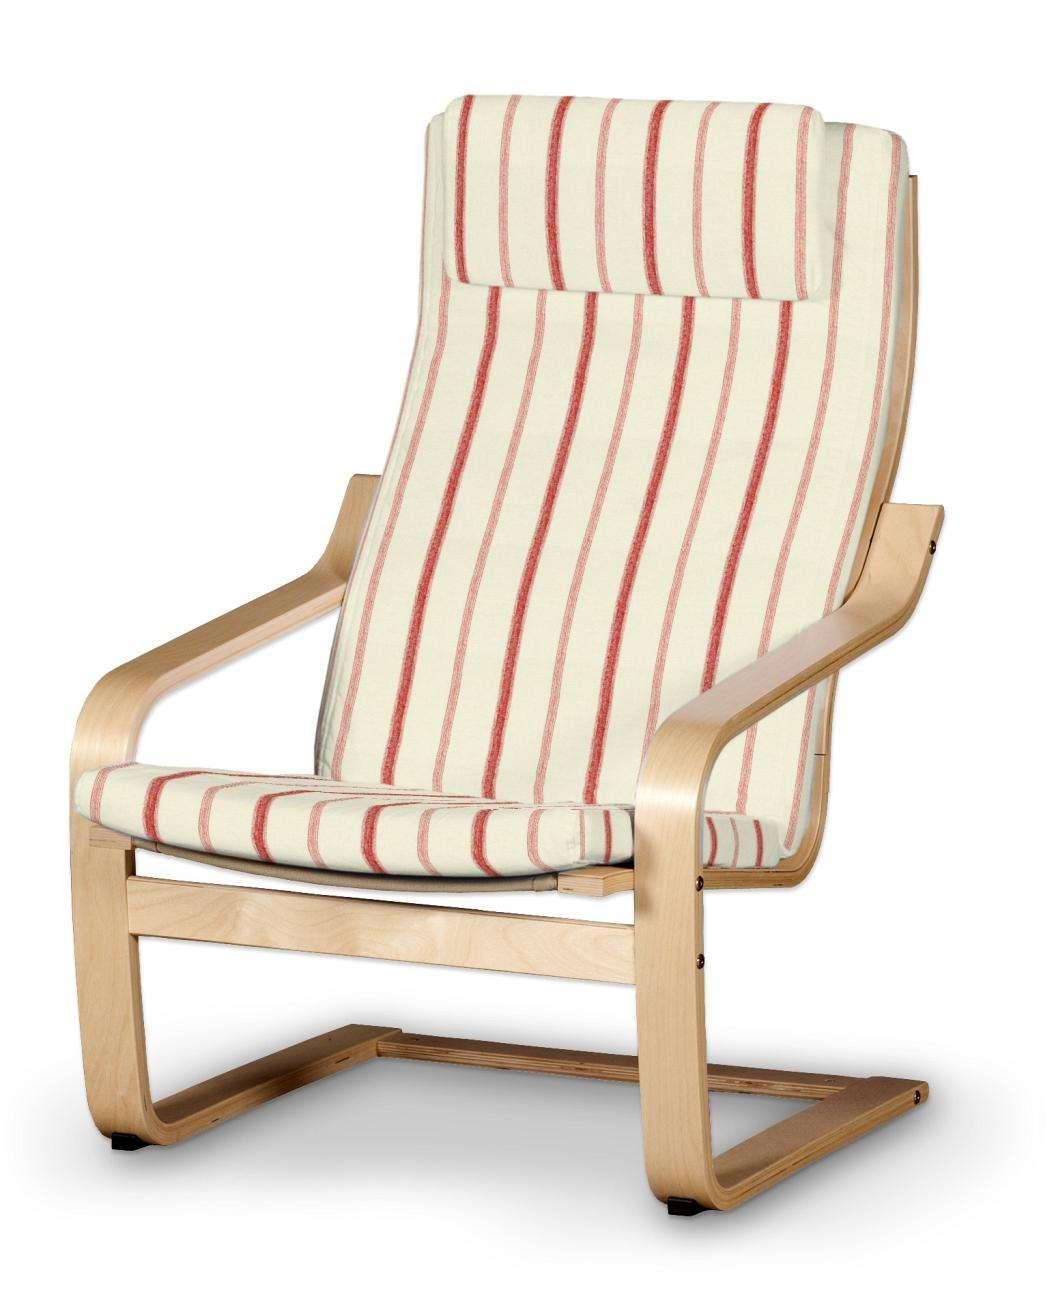 Po 228 Ng Armchair Cushion Cover With Detachable Headrest